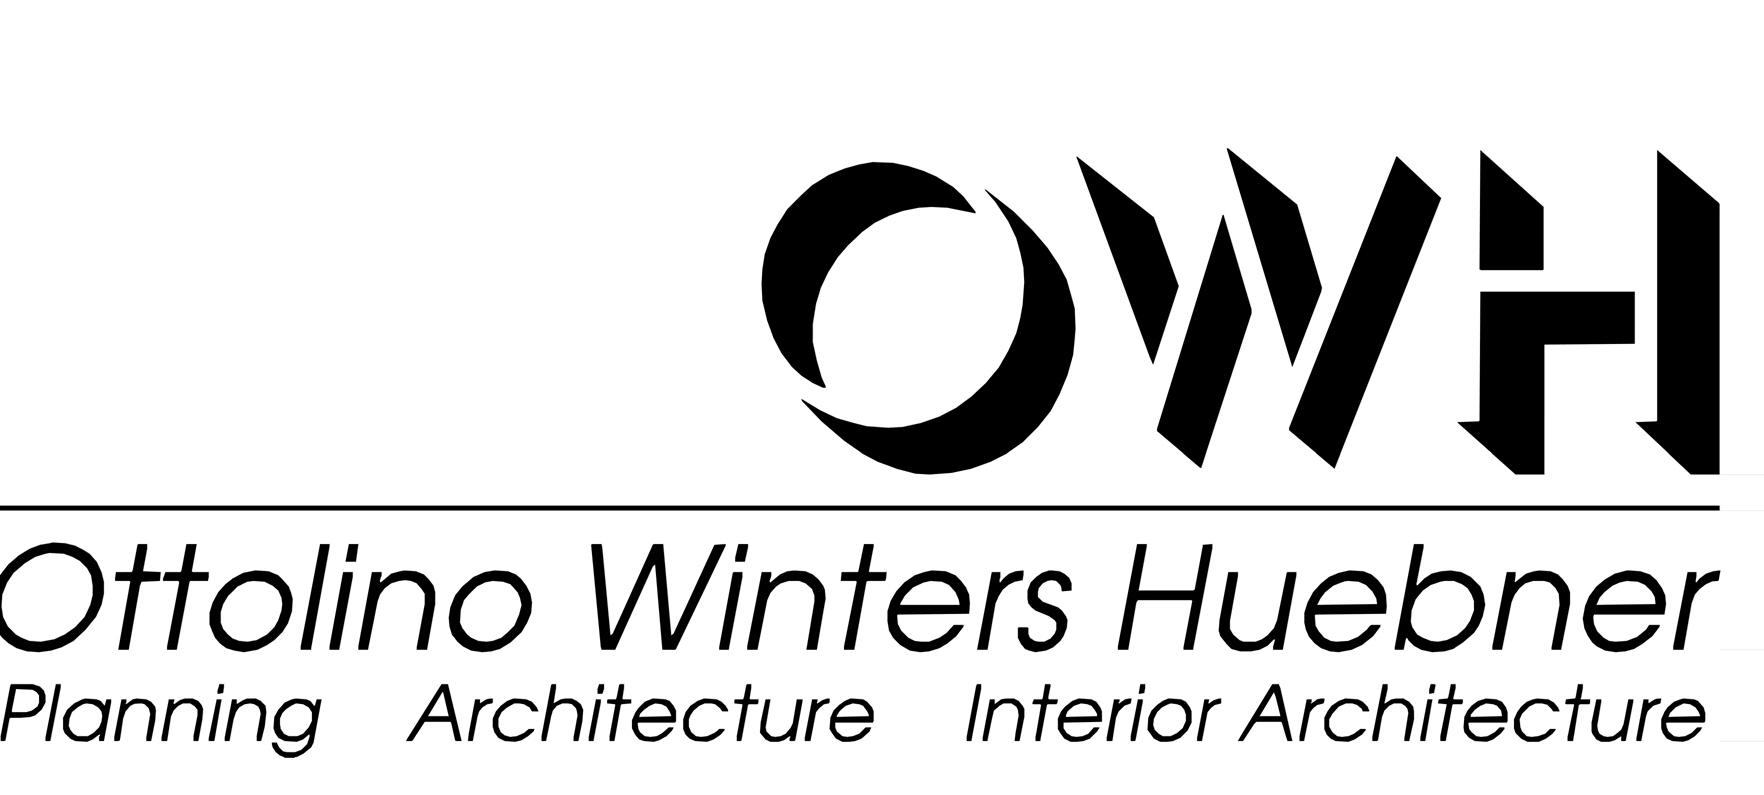 Ottolino Winters Huebner Logo. Planning. Architecture. Interior Architecture.